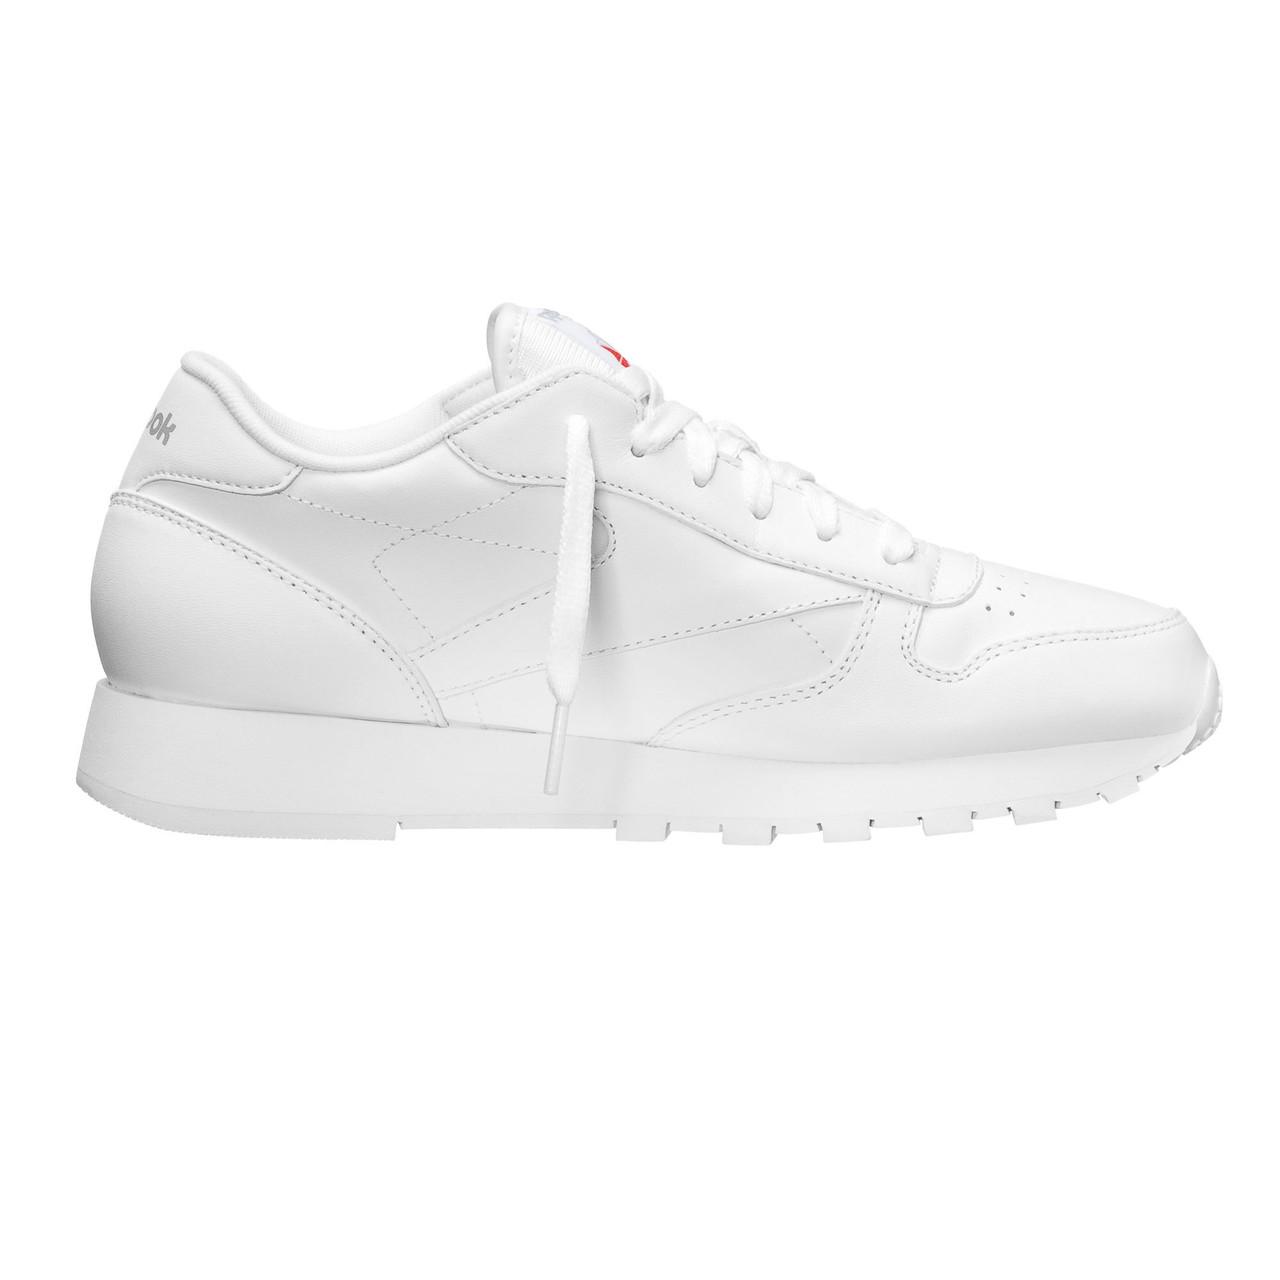 "Женские кроссовки Reebok Classic Leather ""White"""